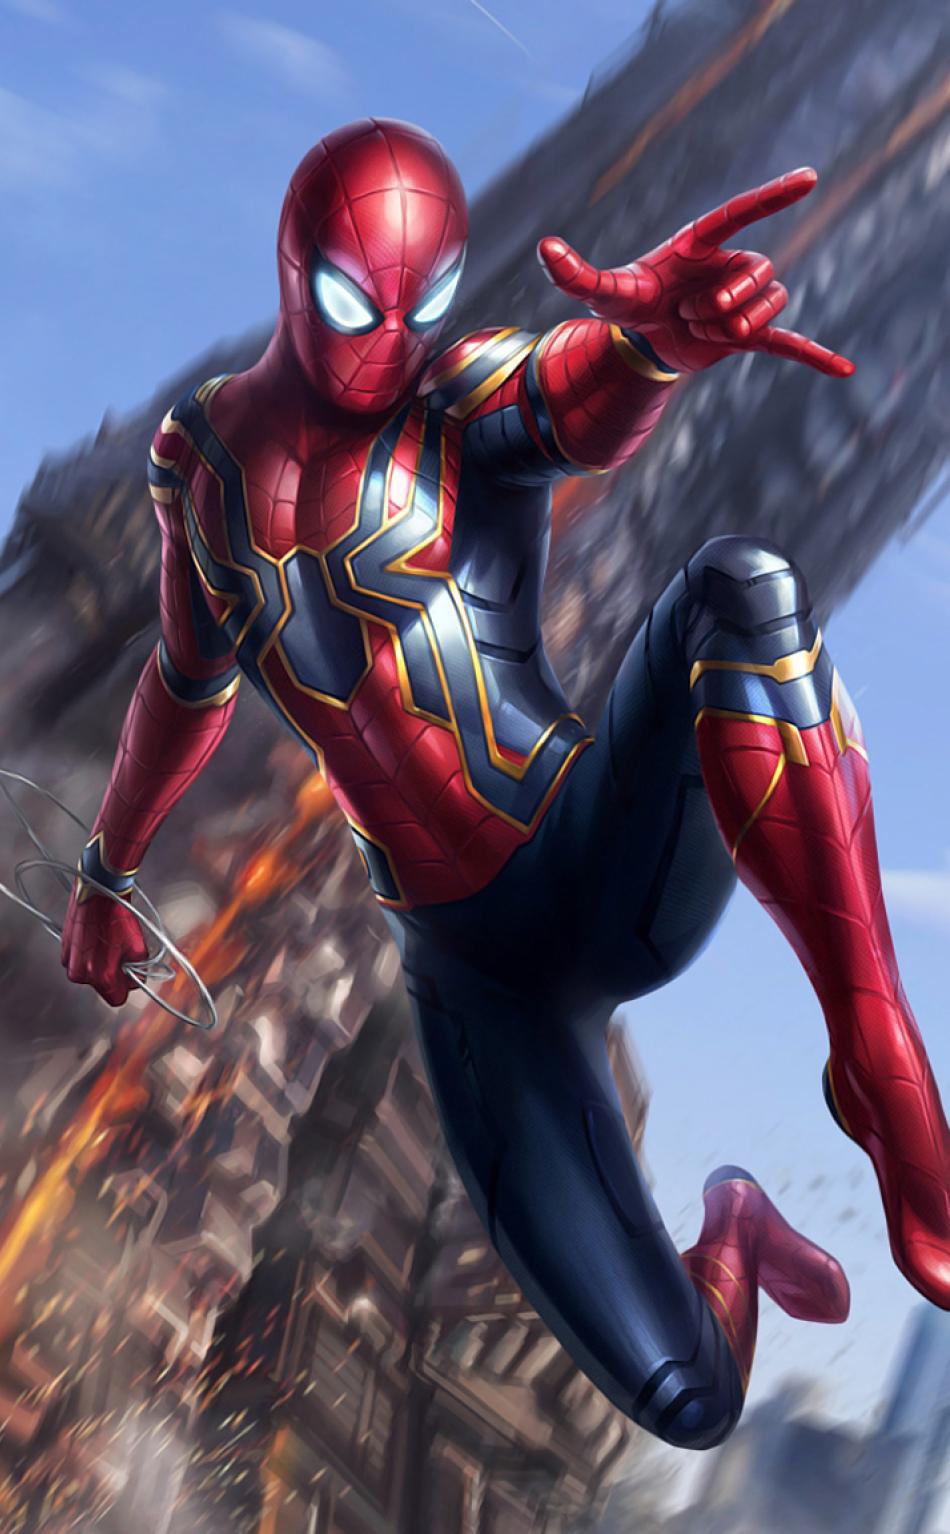 Iron spider avengers infinity war full hd 2k wallpaper - Avengers infinity war wallpaper iphone ...